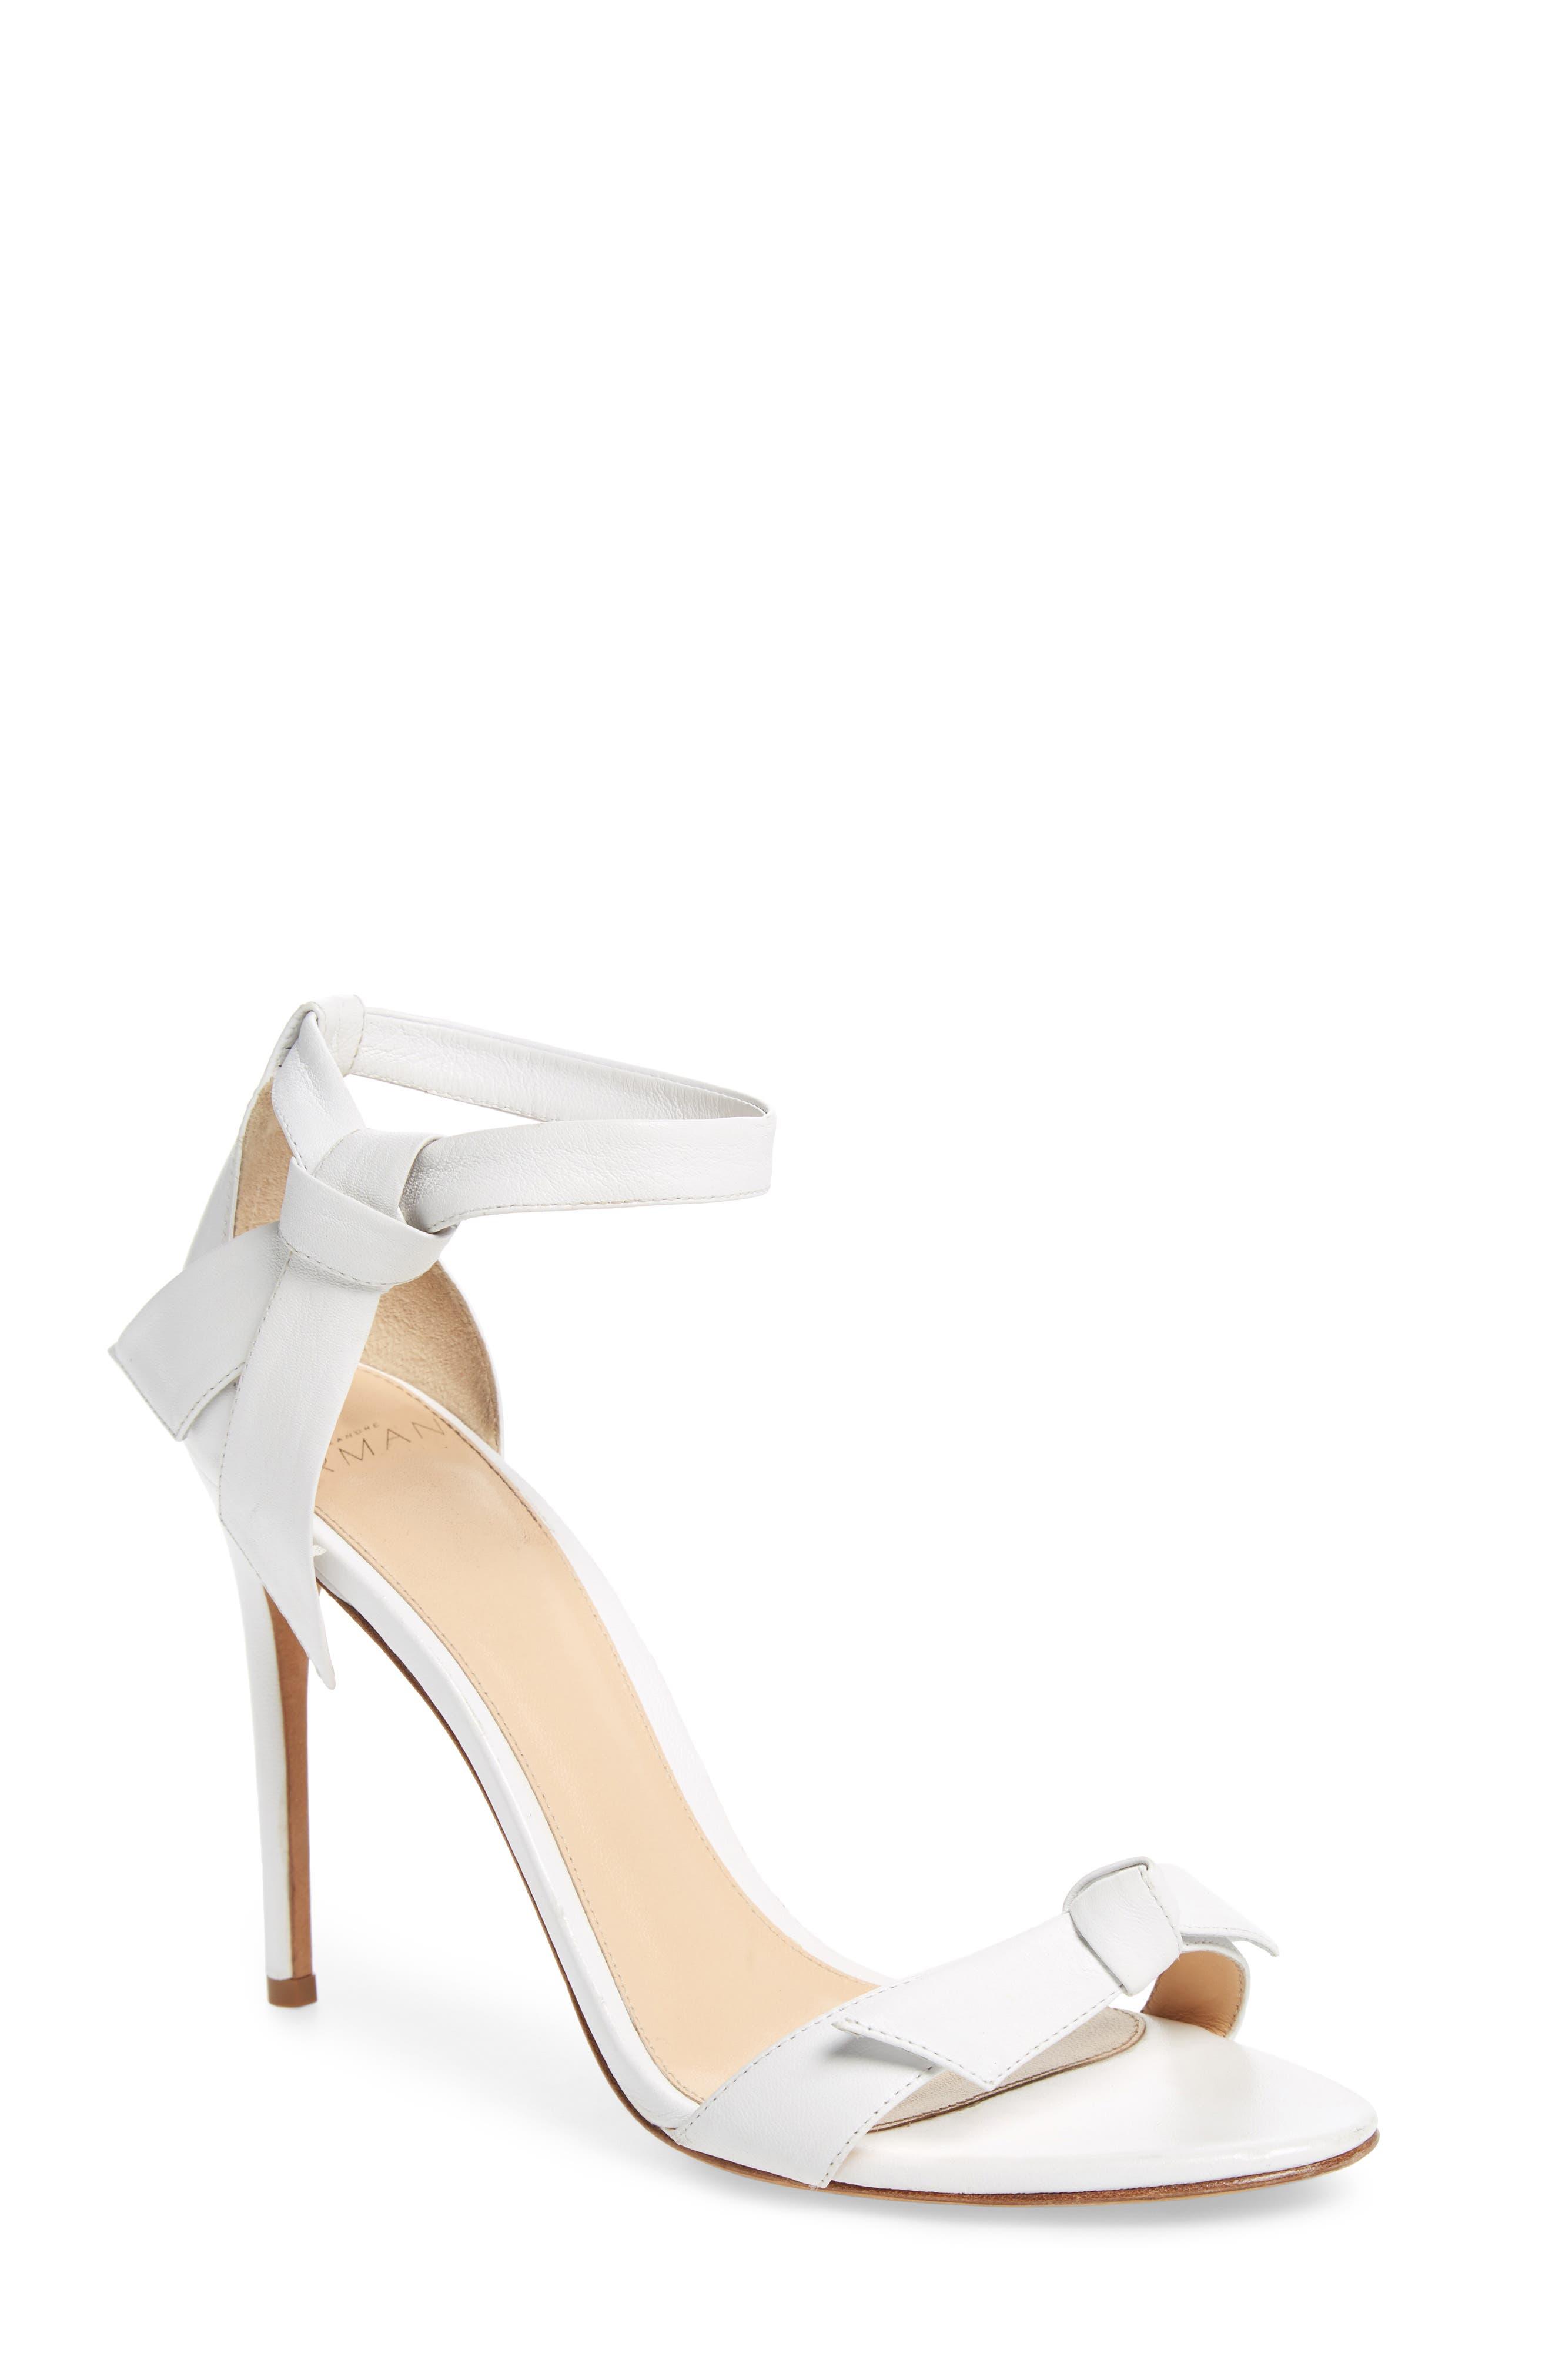 'Clarita' Ankle Tie Sandal,                             Main thumbnail 1, color,                             WHITE LEATHER